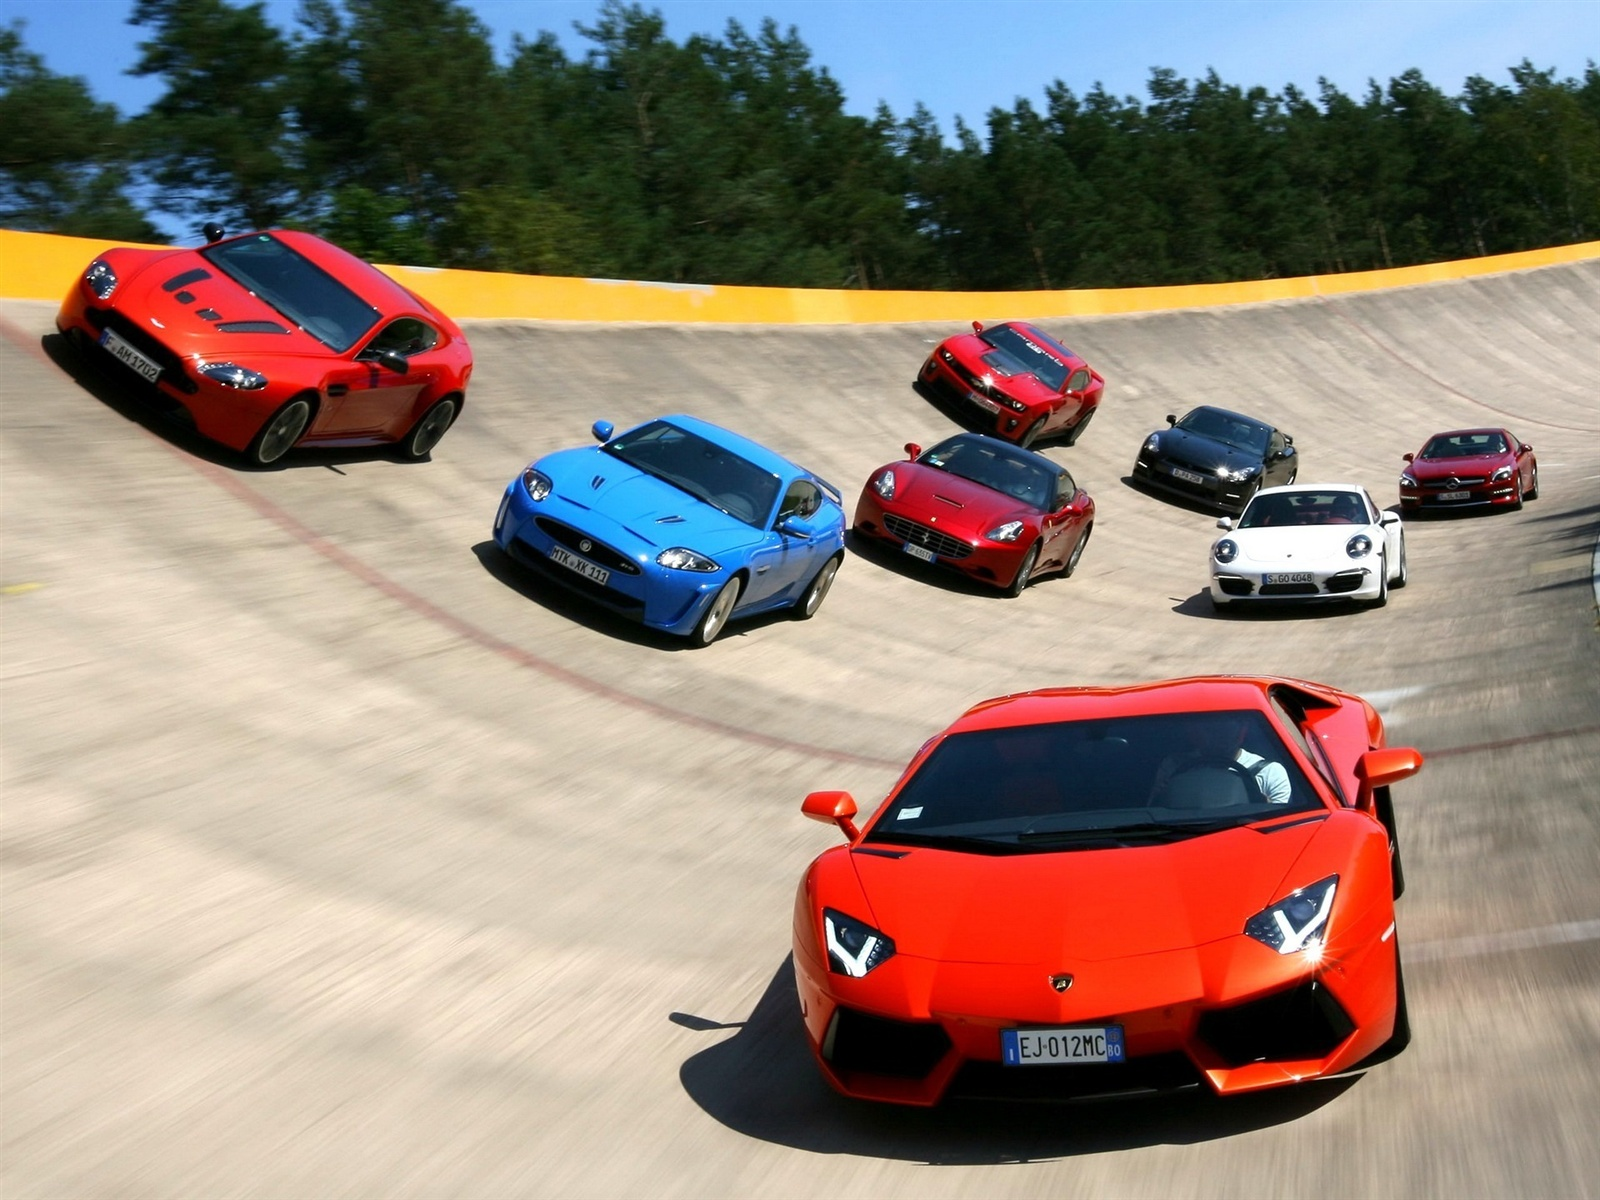 Download wallpaper 1600x1200 famous sports car race track - Car racing wallpaper free download ...